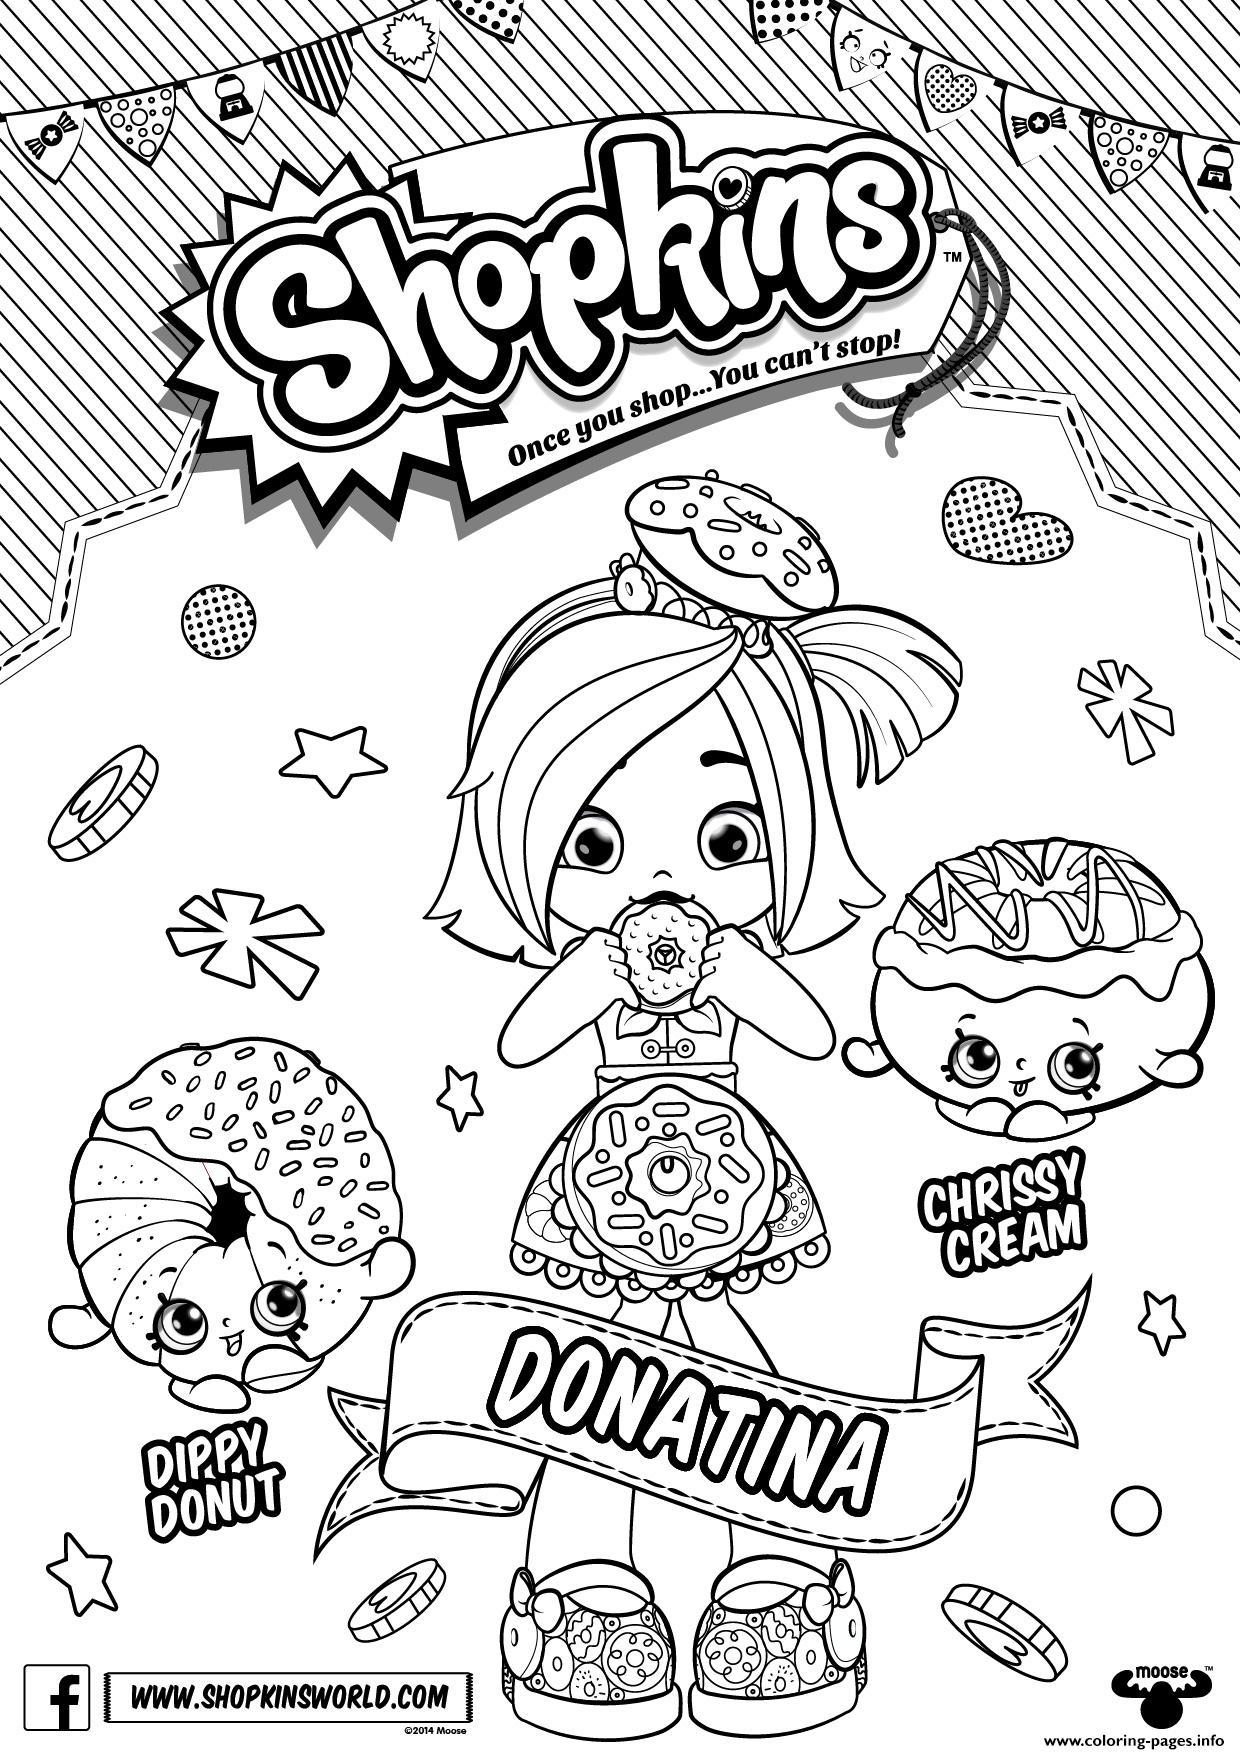 Shopkins Season 6 Doll Chef Club Donatina Coloring Pages Printable